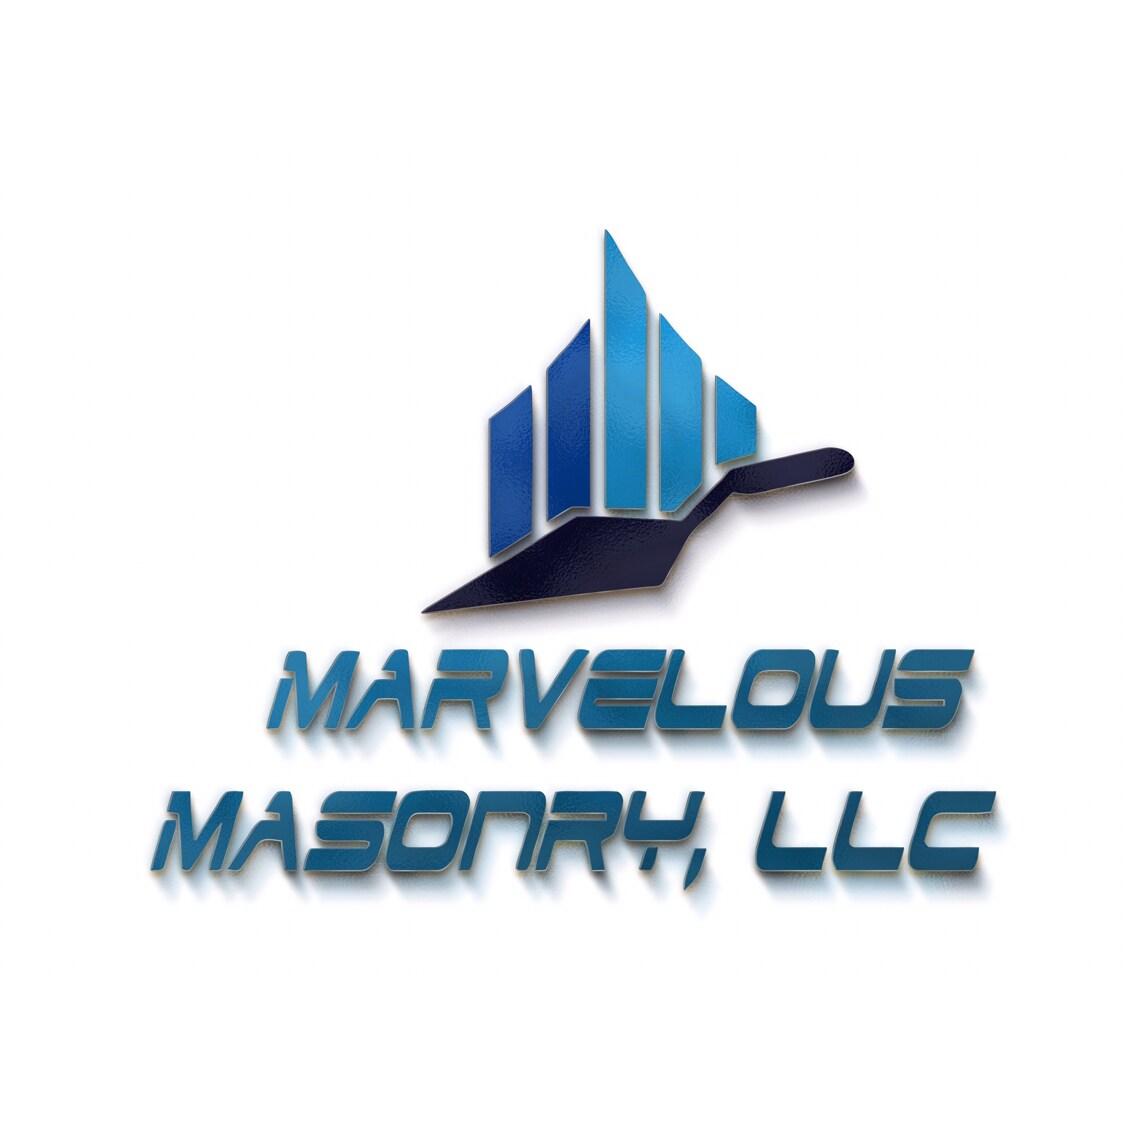 Marvelous Masonry LLC